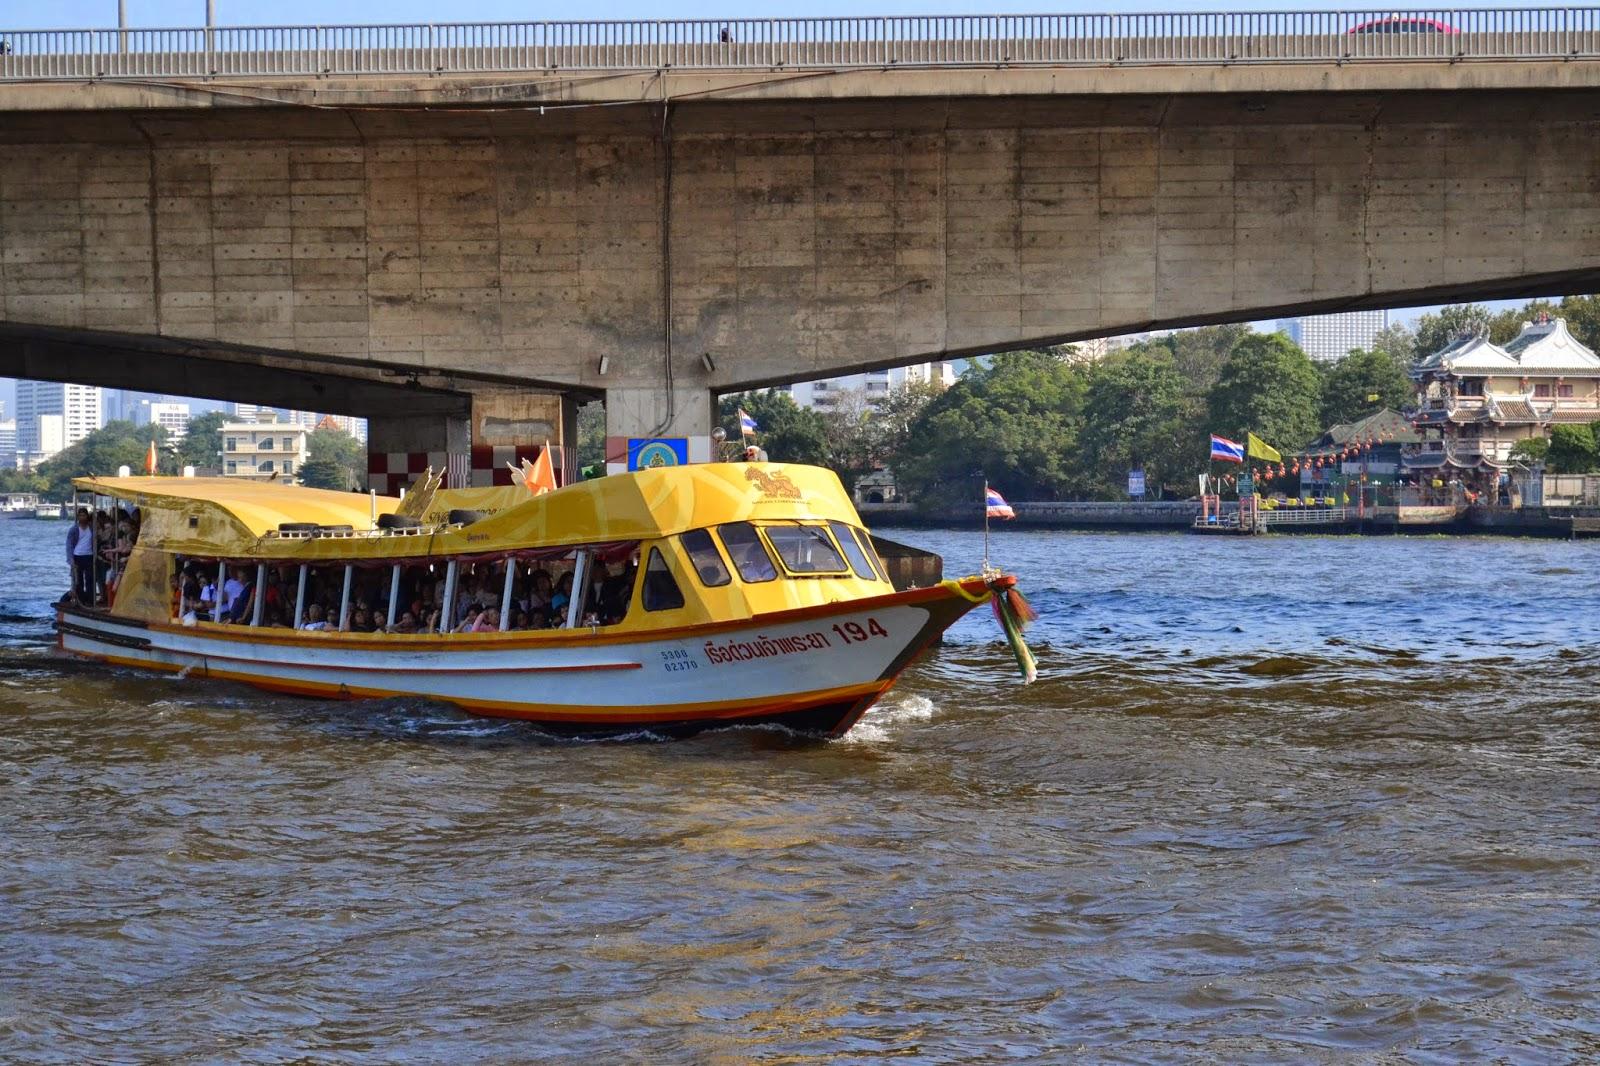 Chao Phraya, Bangkok, Thailande, Fleuve, voyage, bateau, bateau-taxi, navette,Chao Phraya Express Boat, express boat